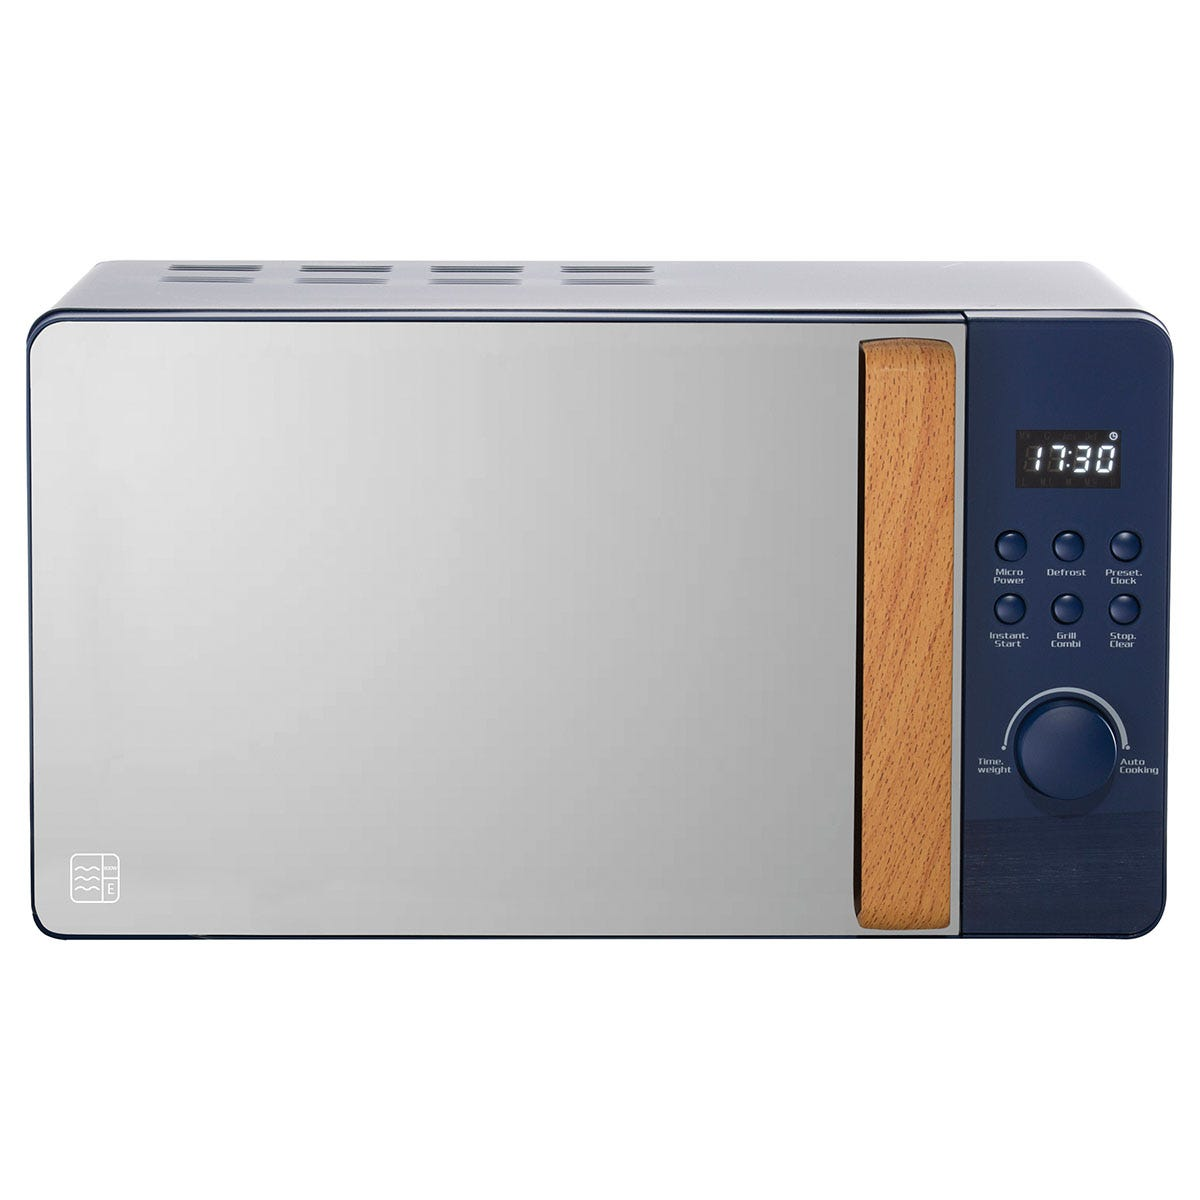 Daewoo SDA1707 Skandik 20L 800W Wooden-Handled Digital Microwave - Navy Blue